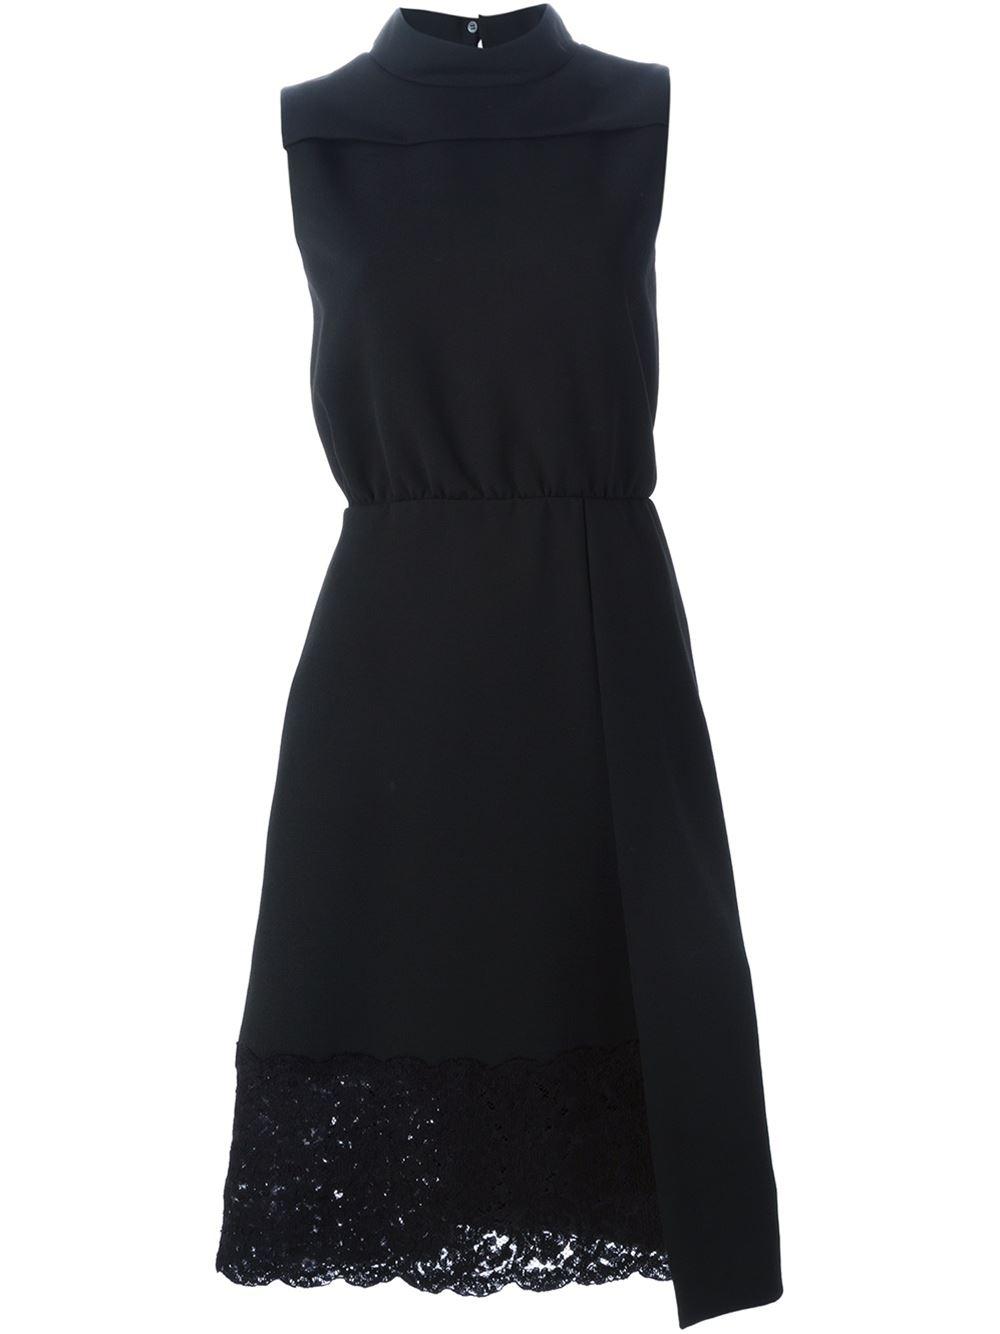 Lace hem asymmetric detail dress, £679.66, No. 21. www.farfetch.com